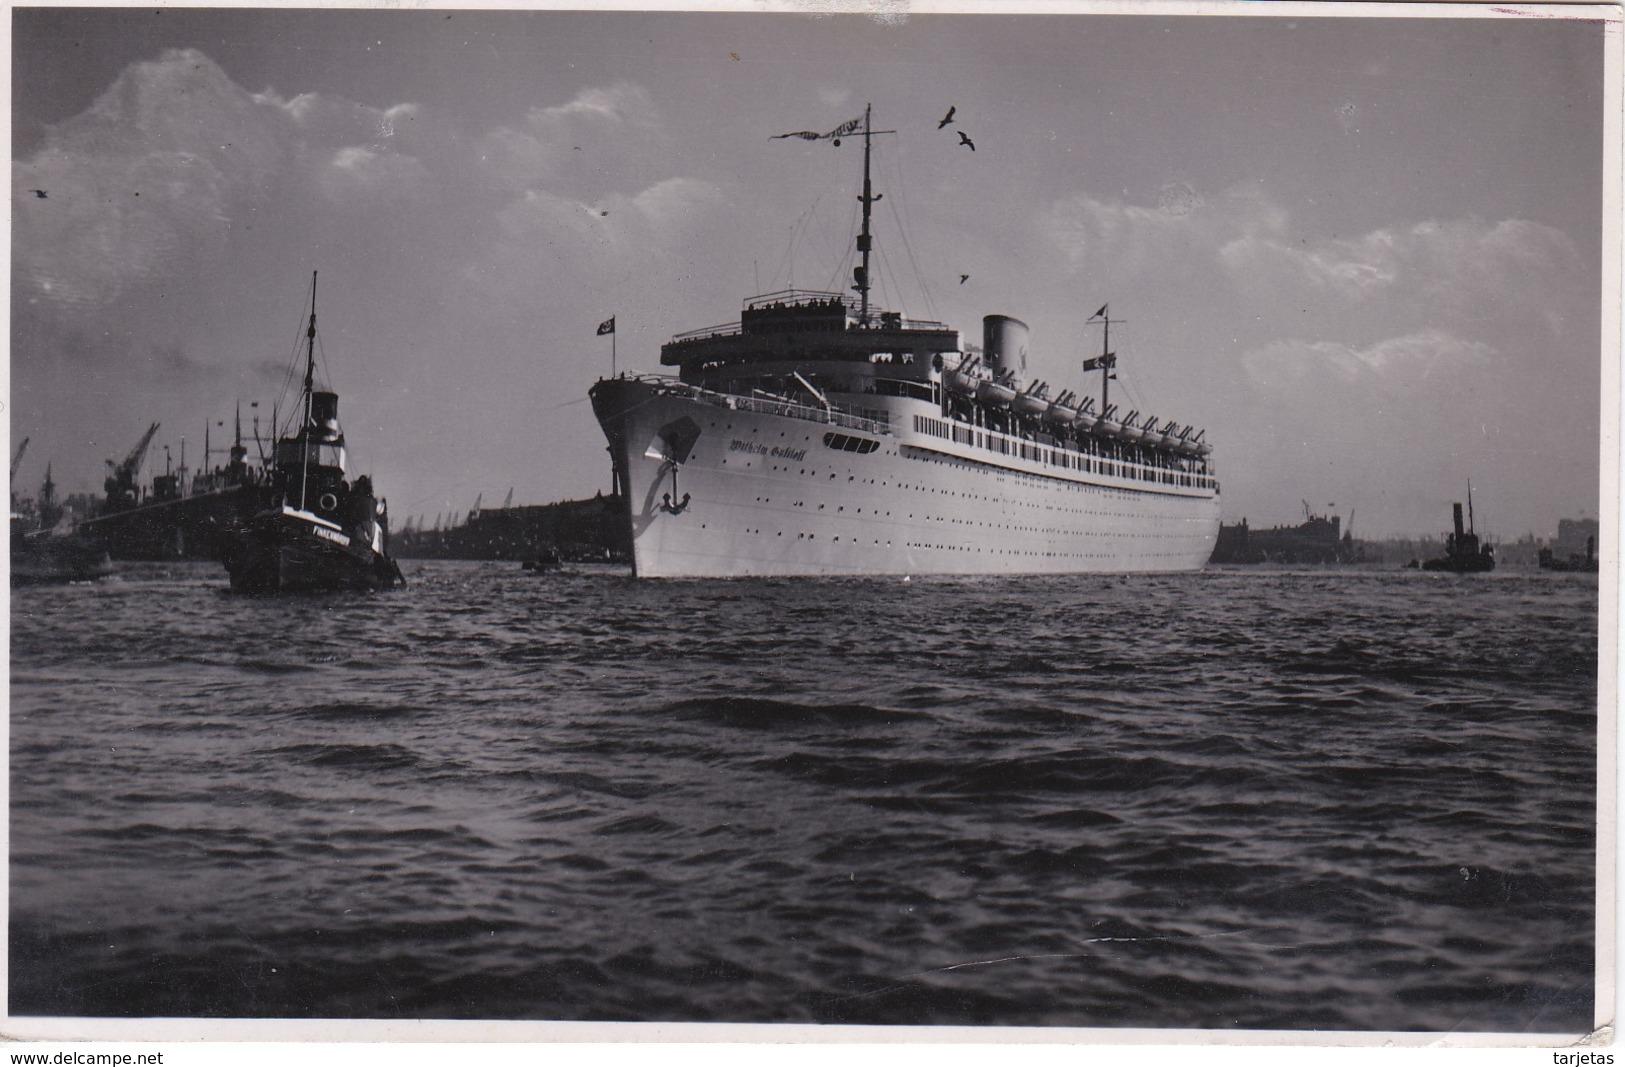 POSTAL DEL BARCO WILHELM (BARCO-SHIP) COLECCION GALILEA - Comercio